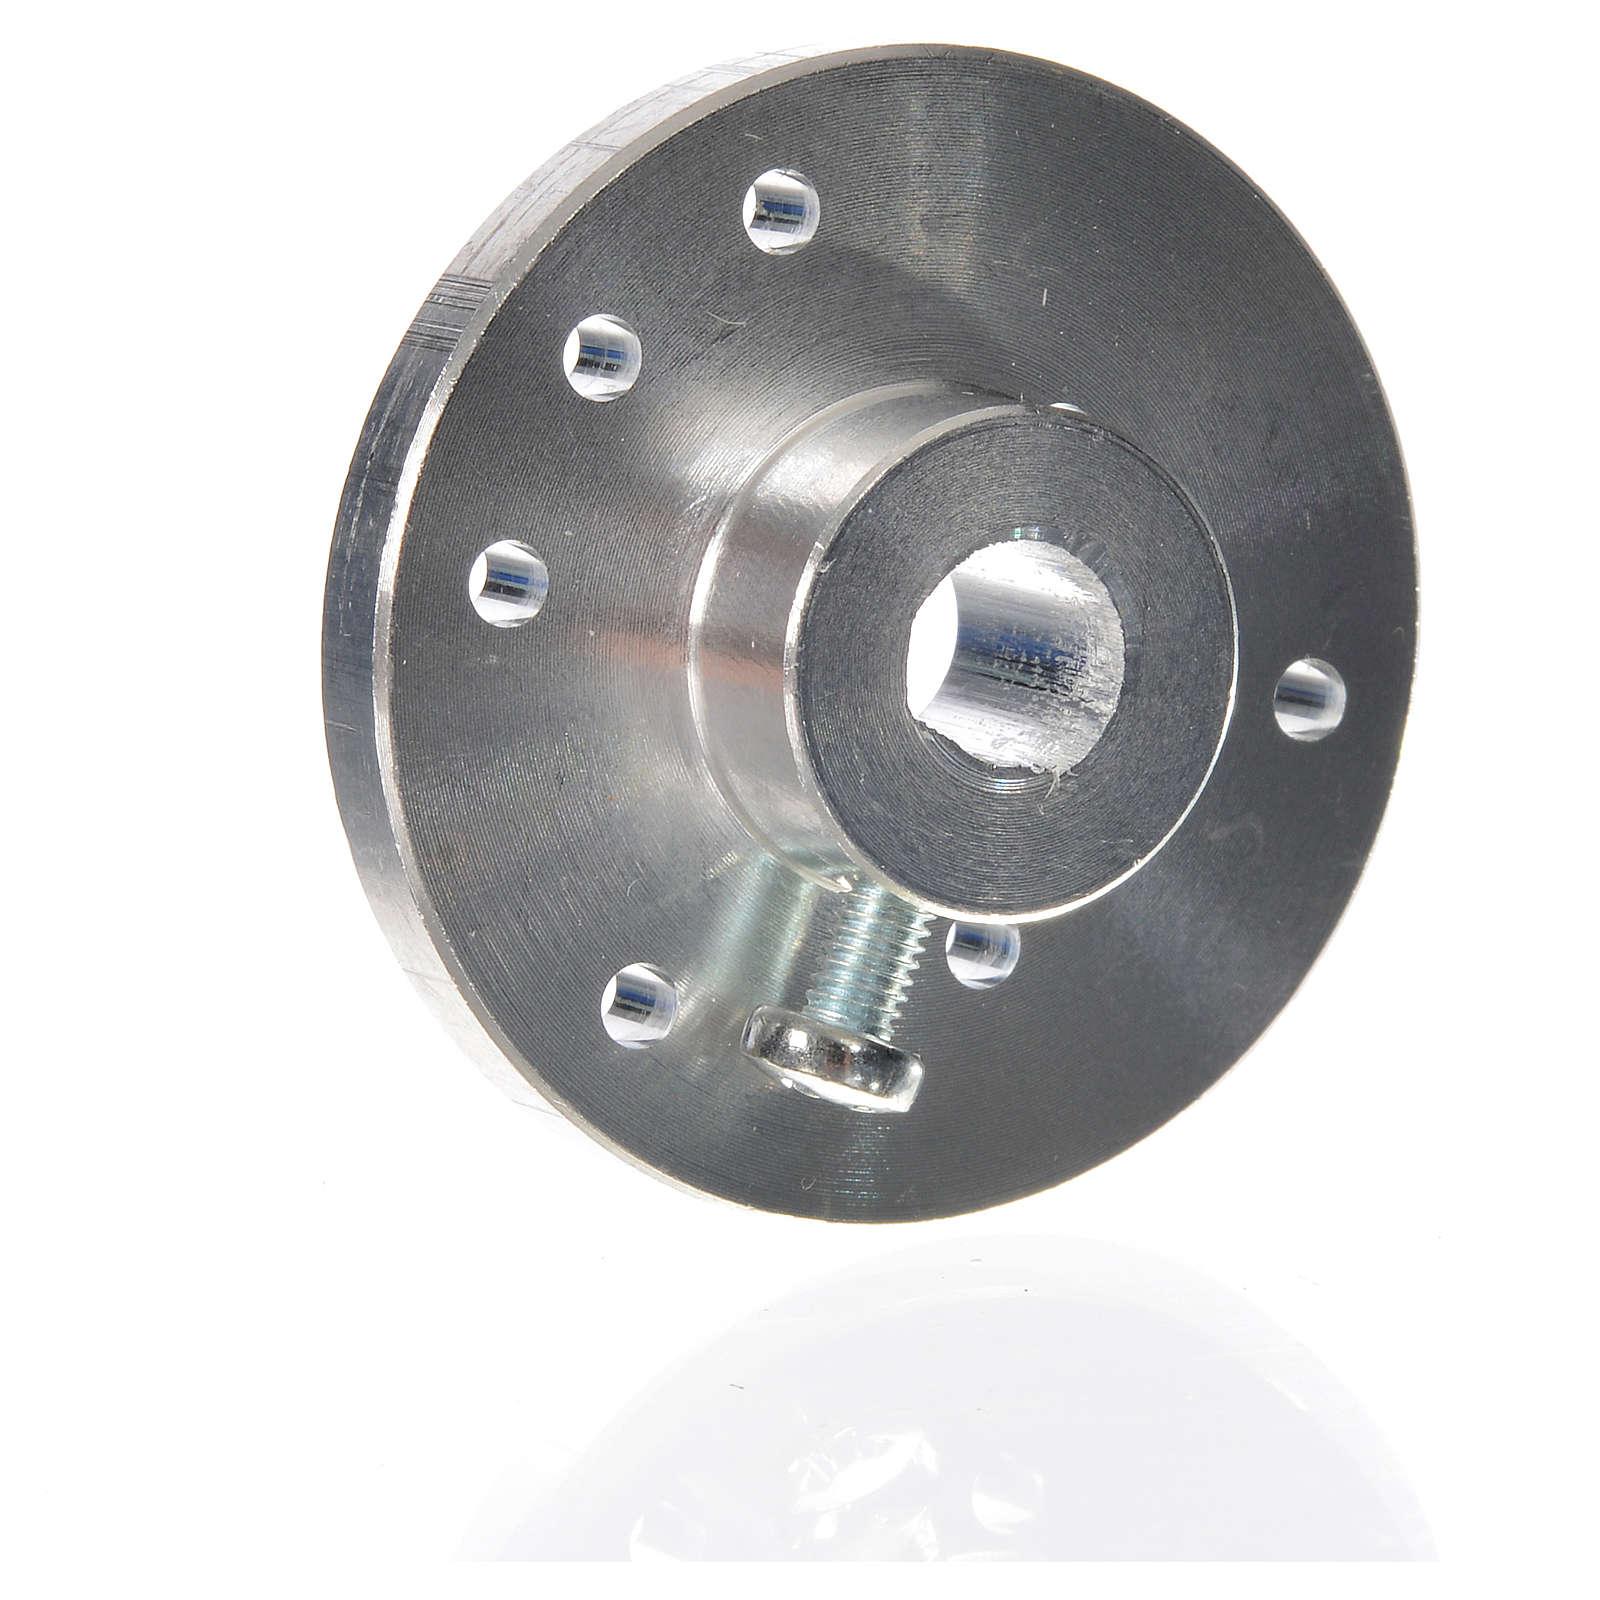 Adaptador para motores 7 mm. ME 4